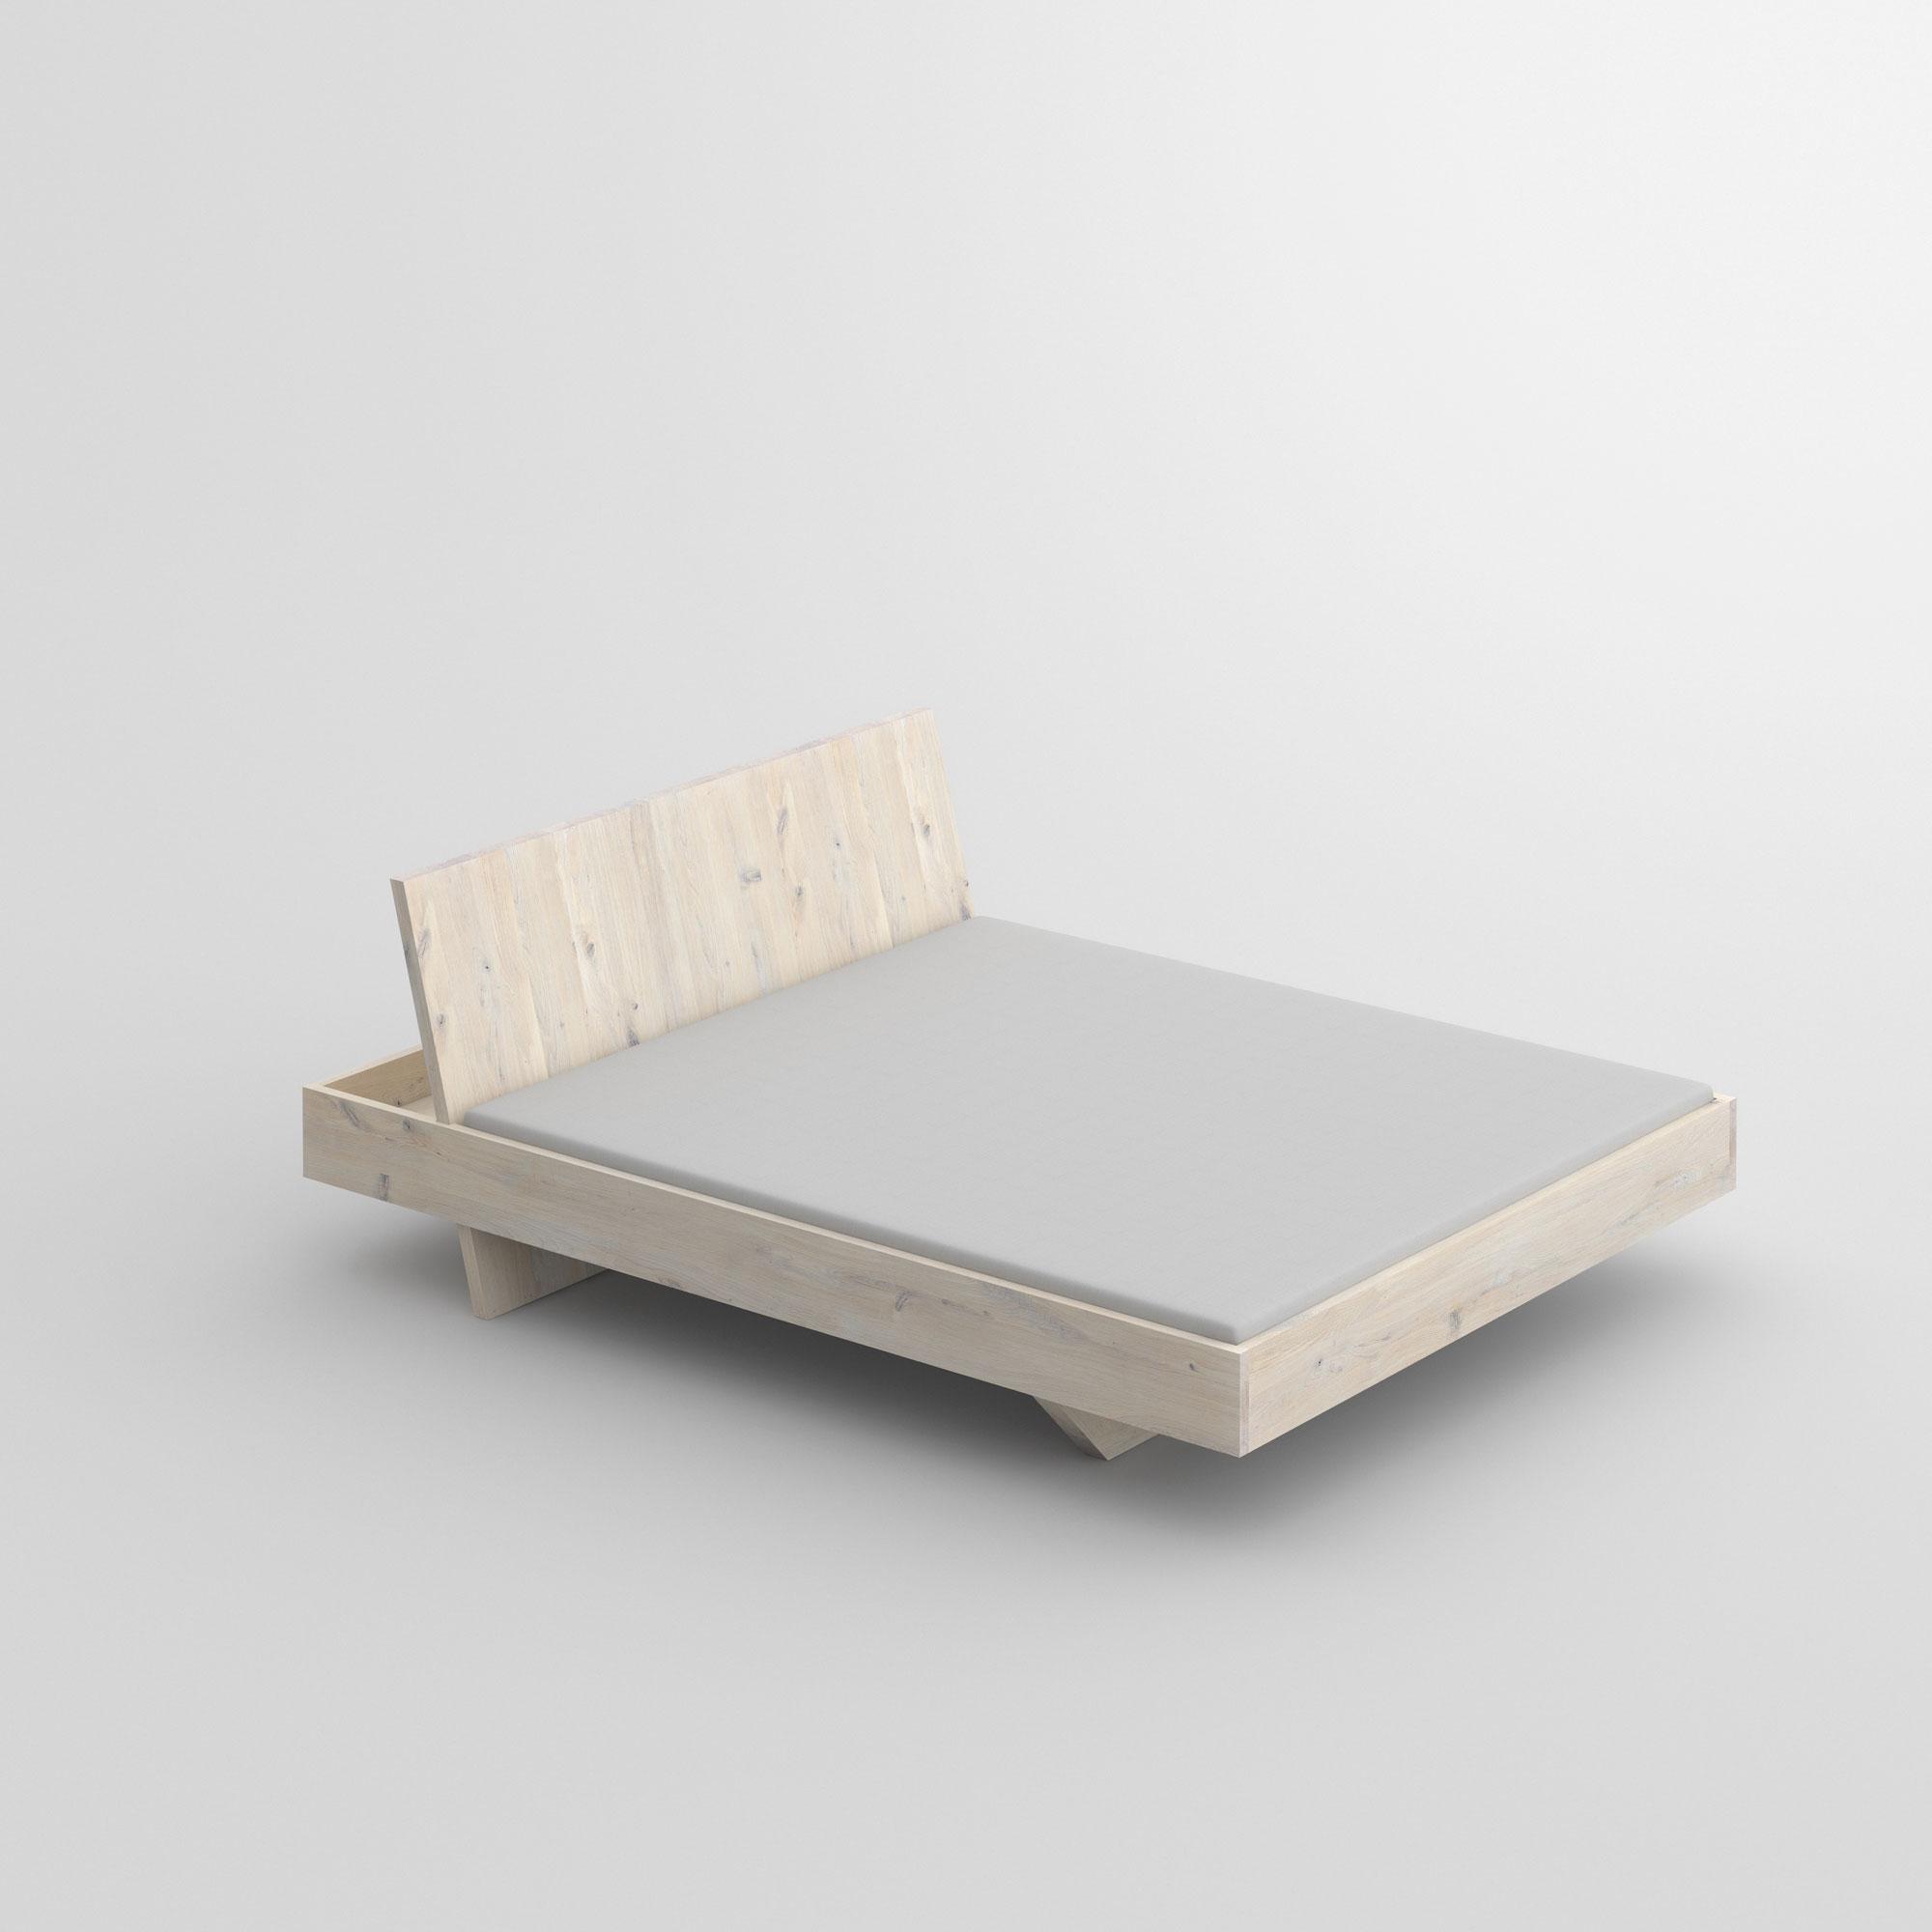 Design Massivholzbett  SOMNIA Maßgefertigt in  von vitamin design